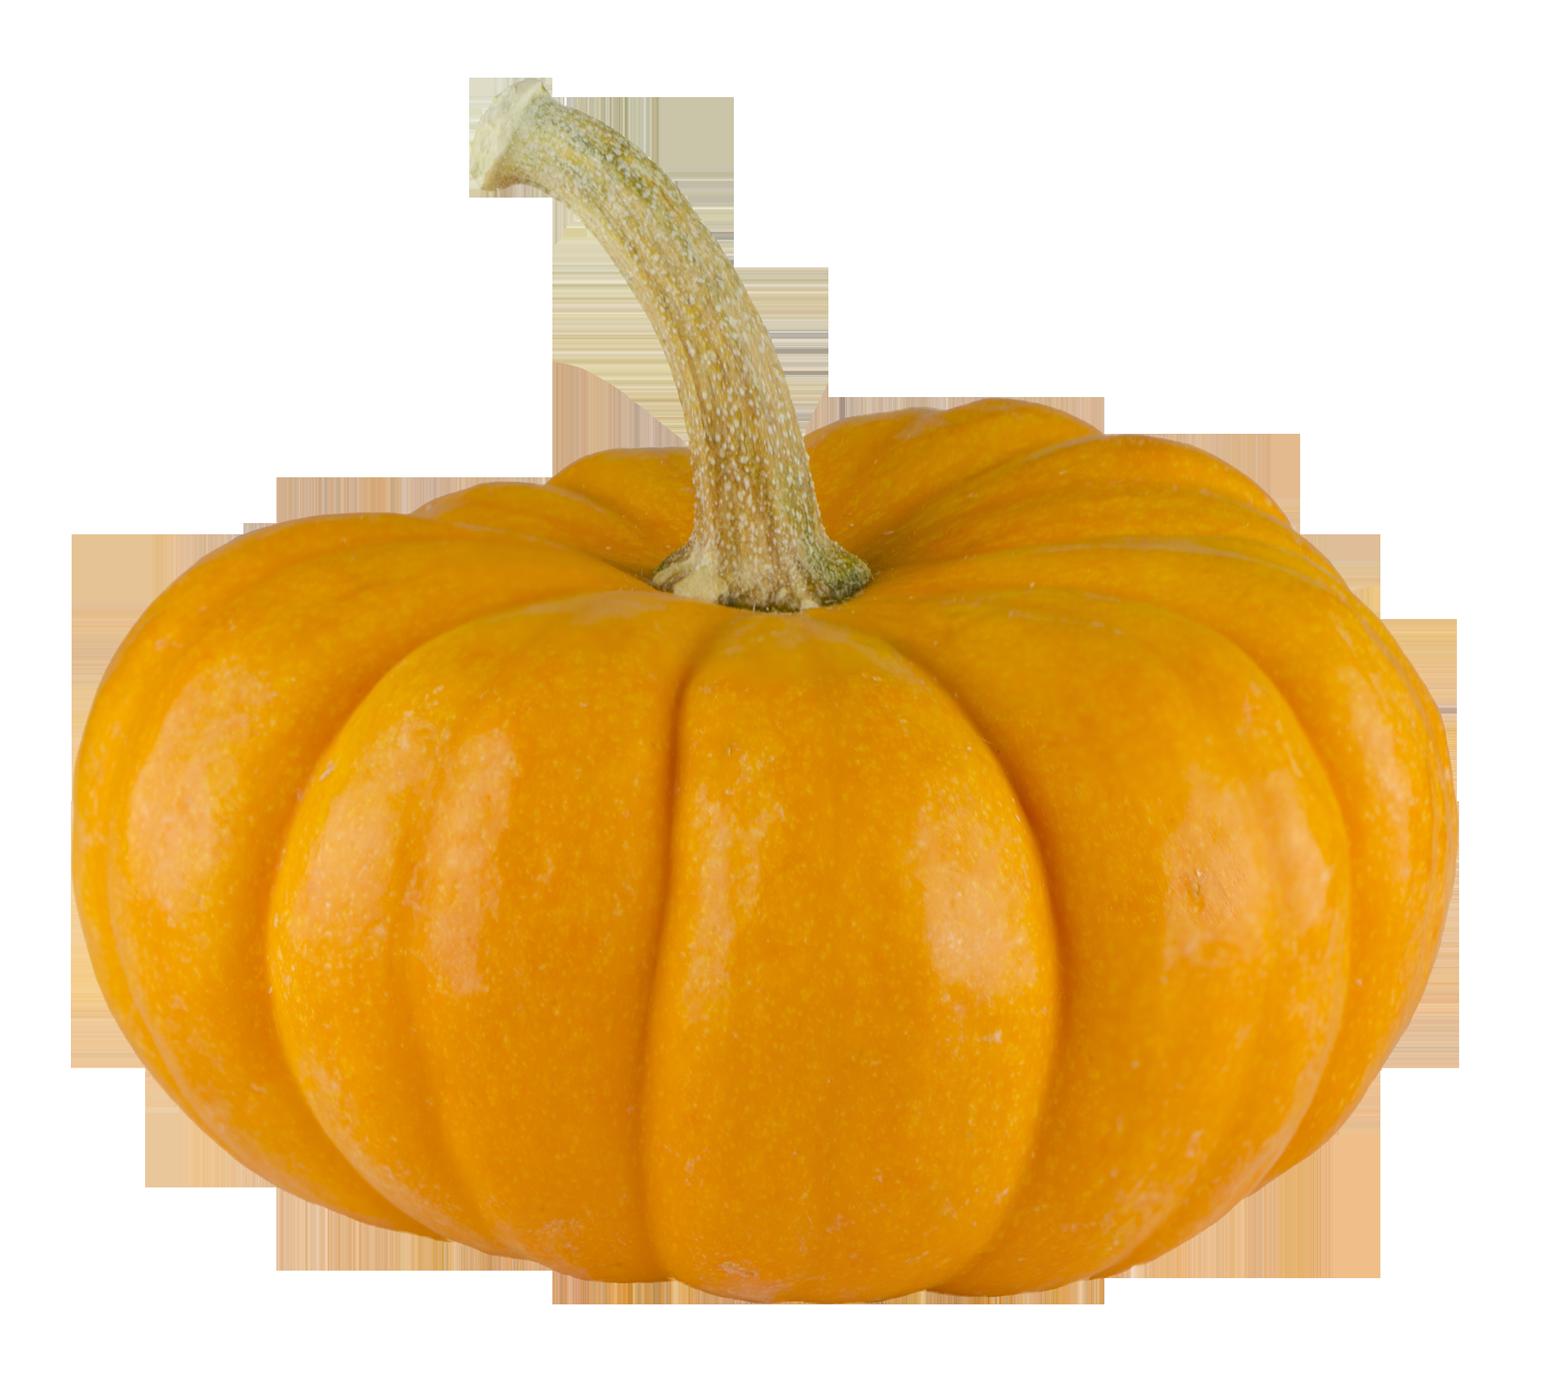 Real Pumpkin Transparent Background - Pumpkin PNG